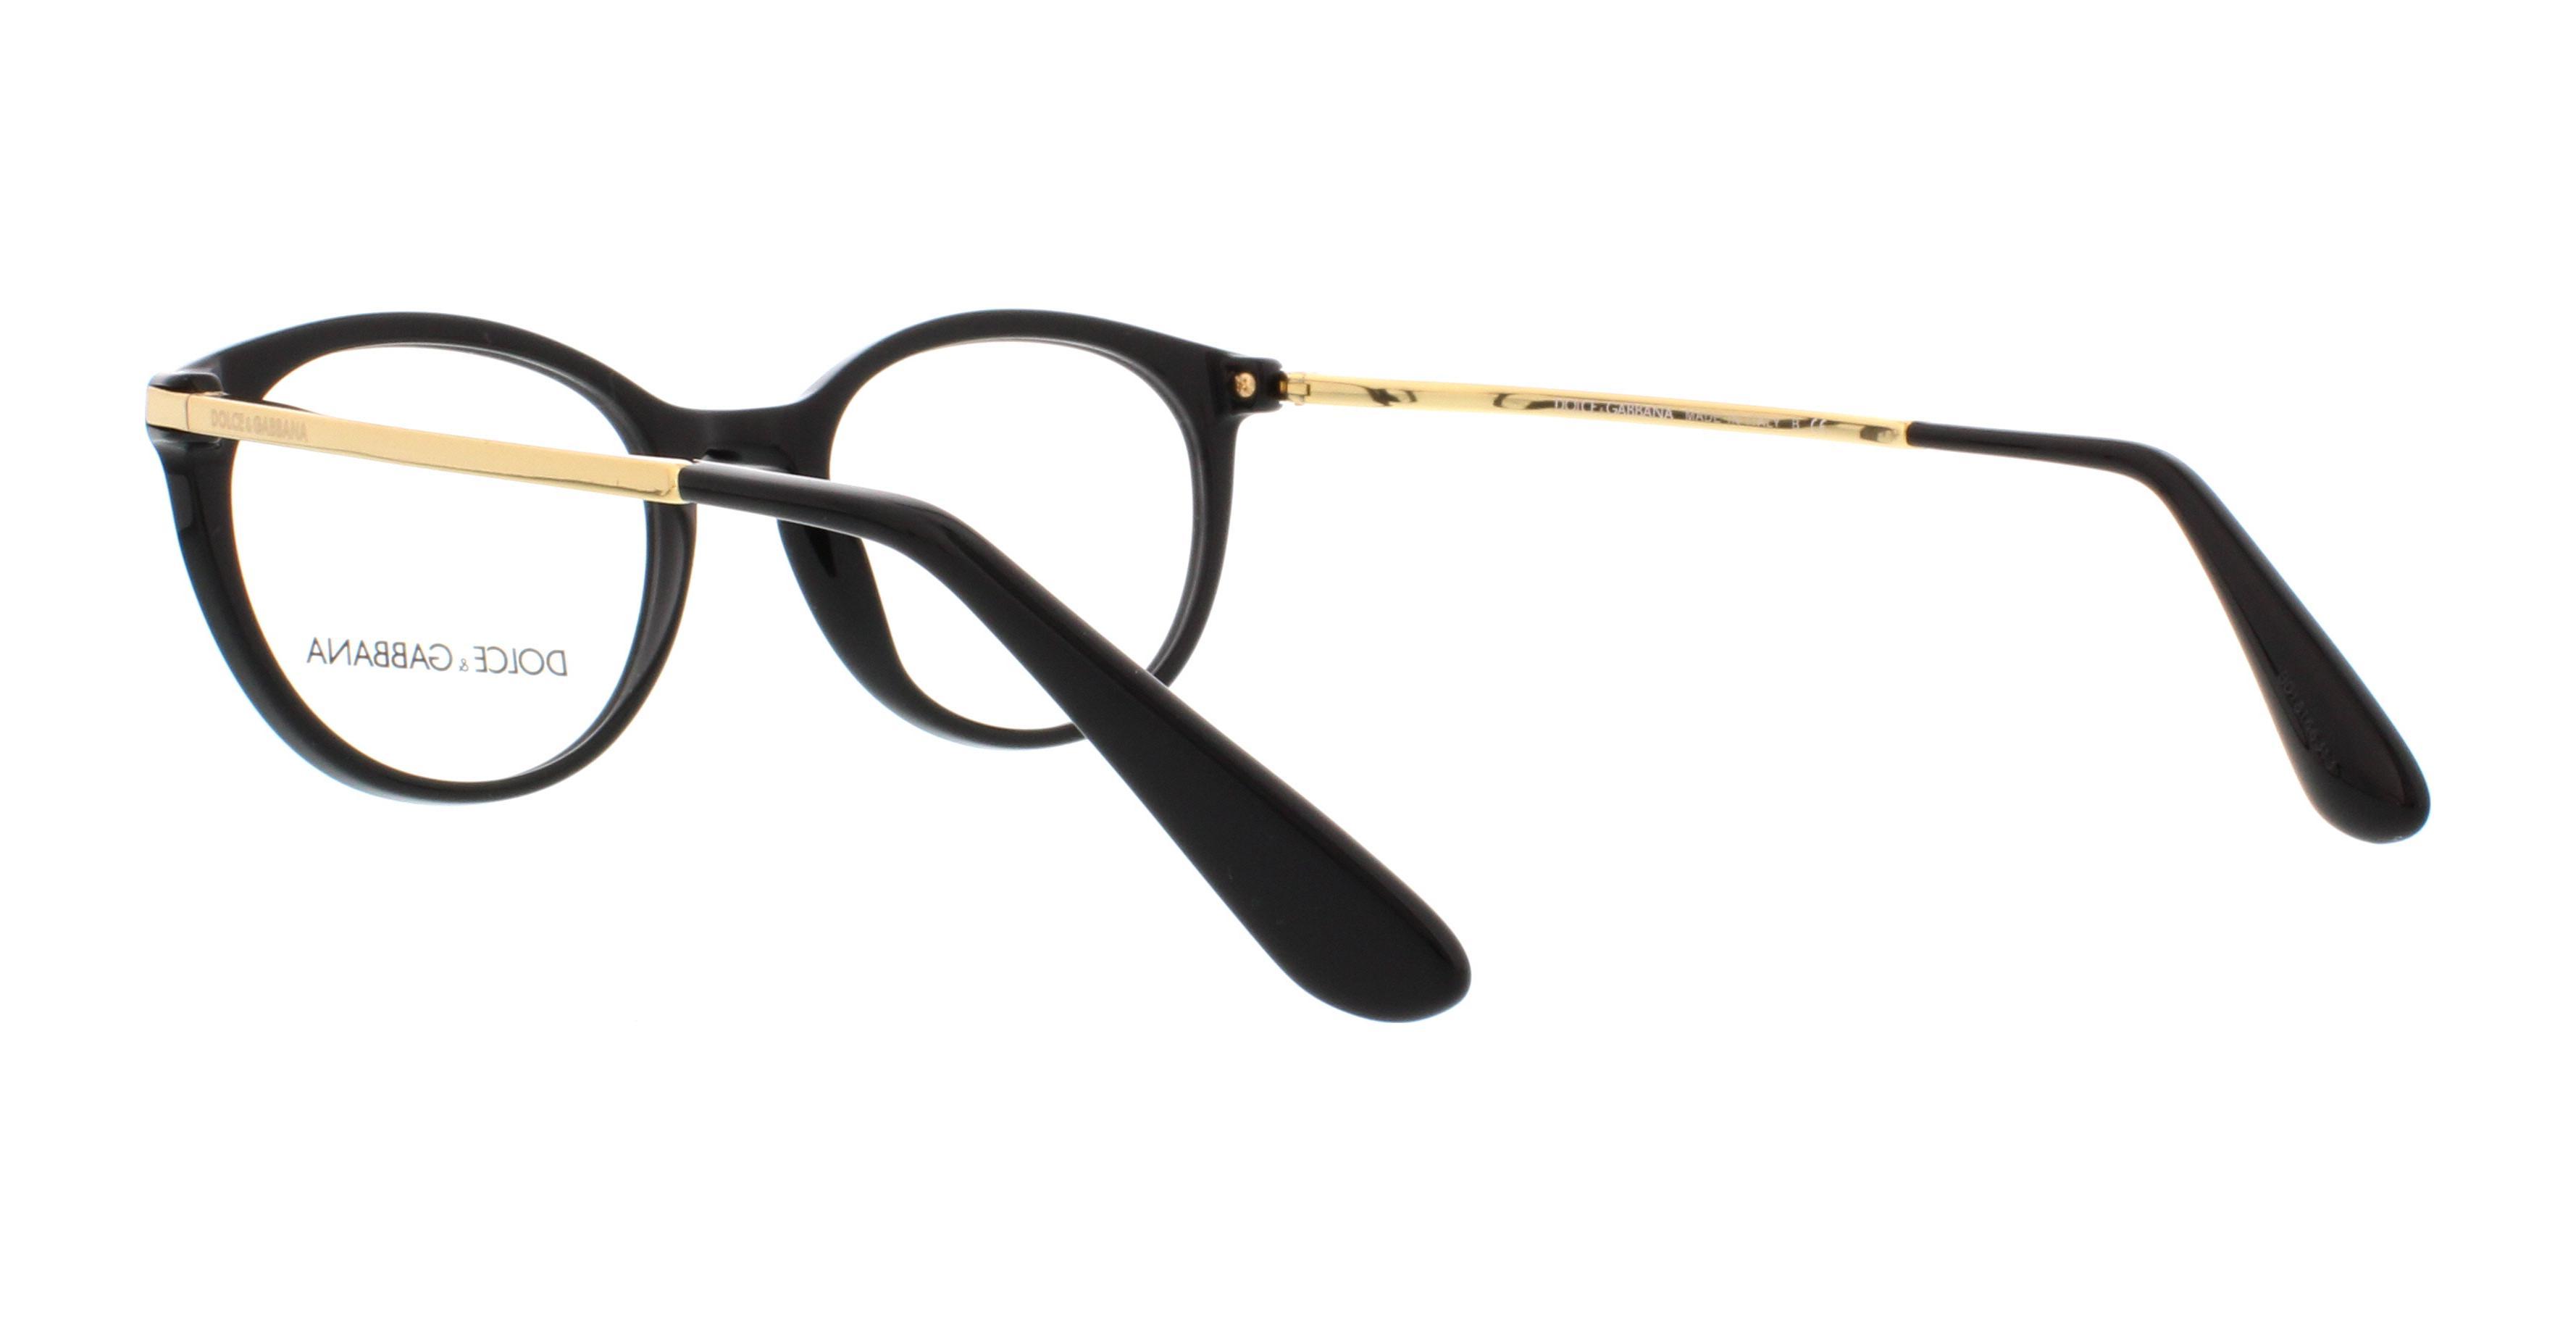 dolce gabbana eyeglasses dg3242 501 black 48mm - Dolce And Gabbana Eyeglass Frames